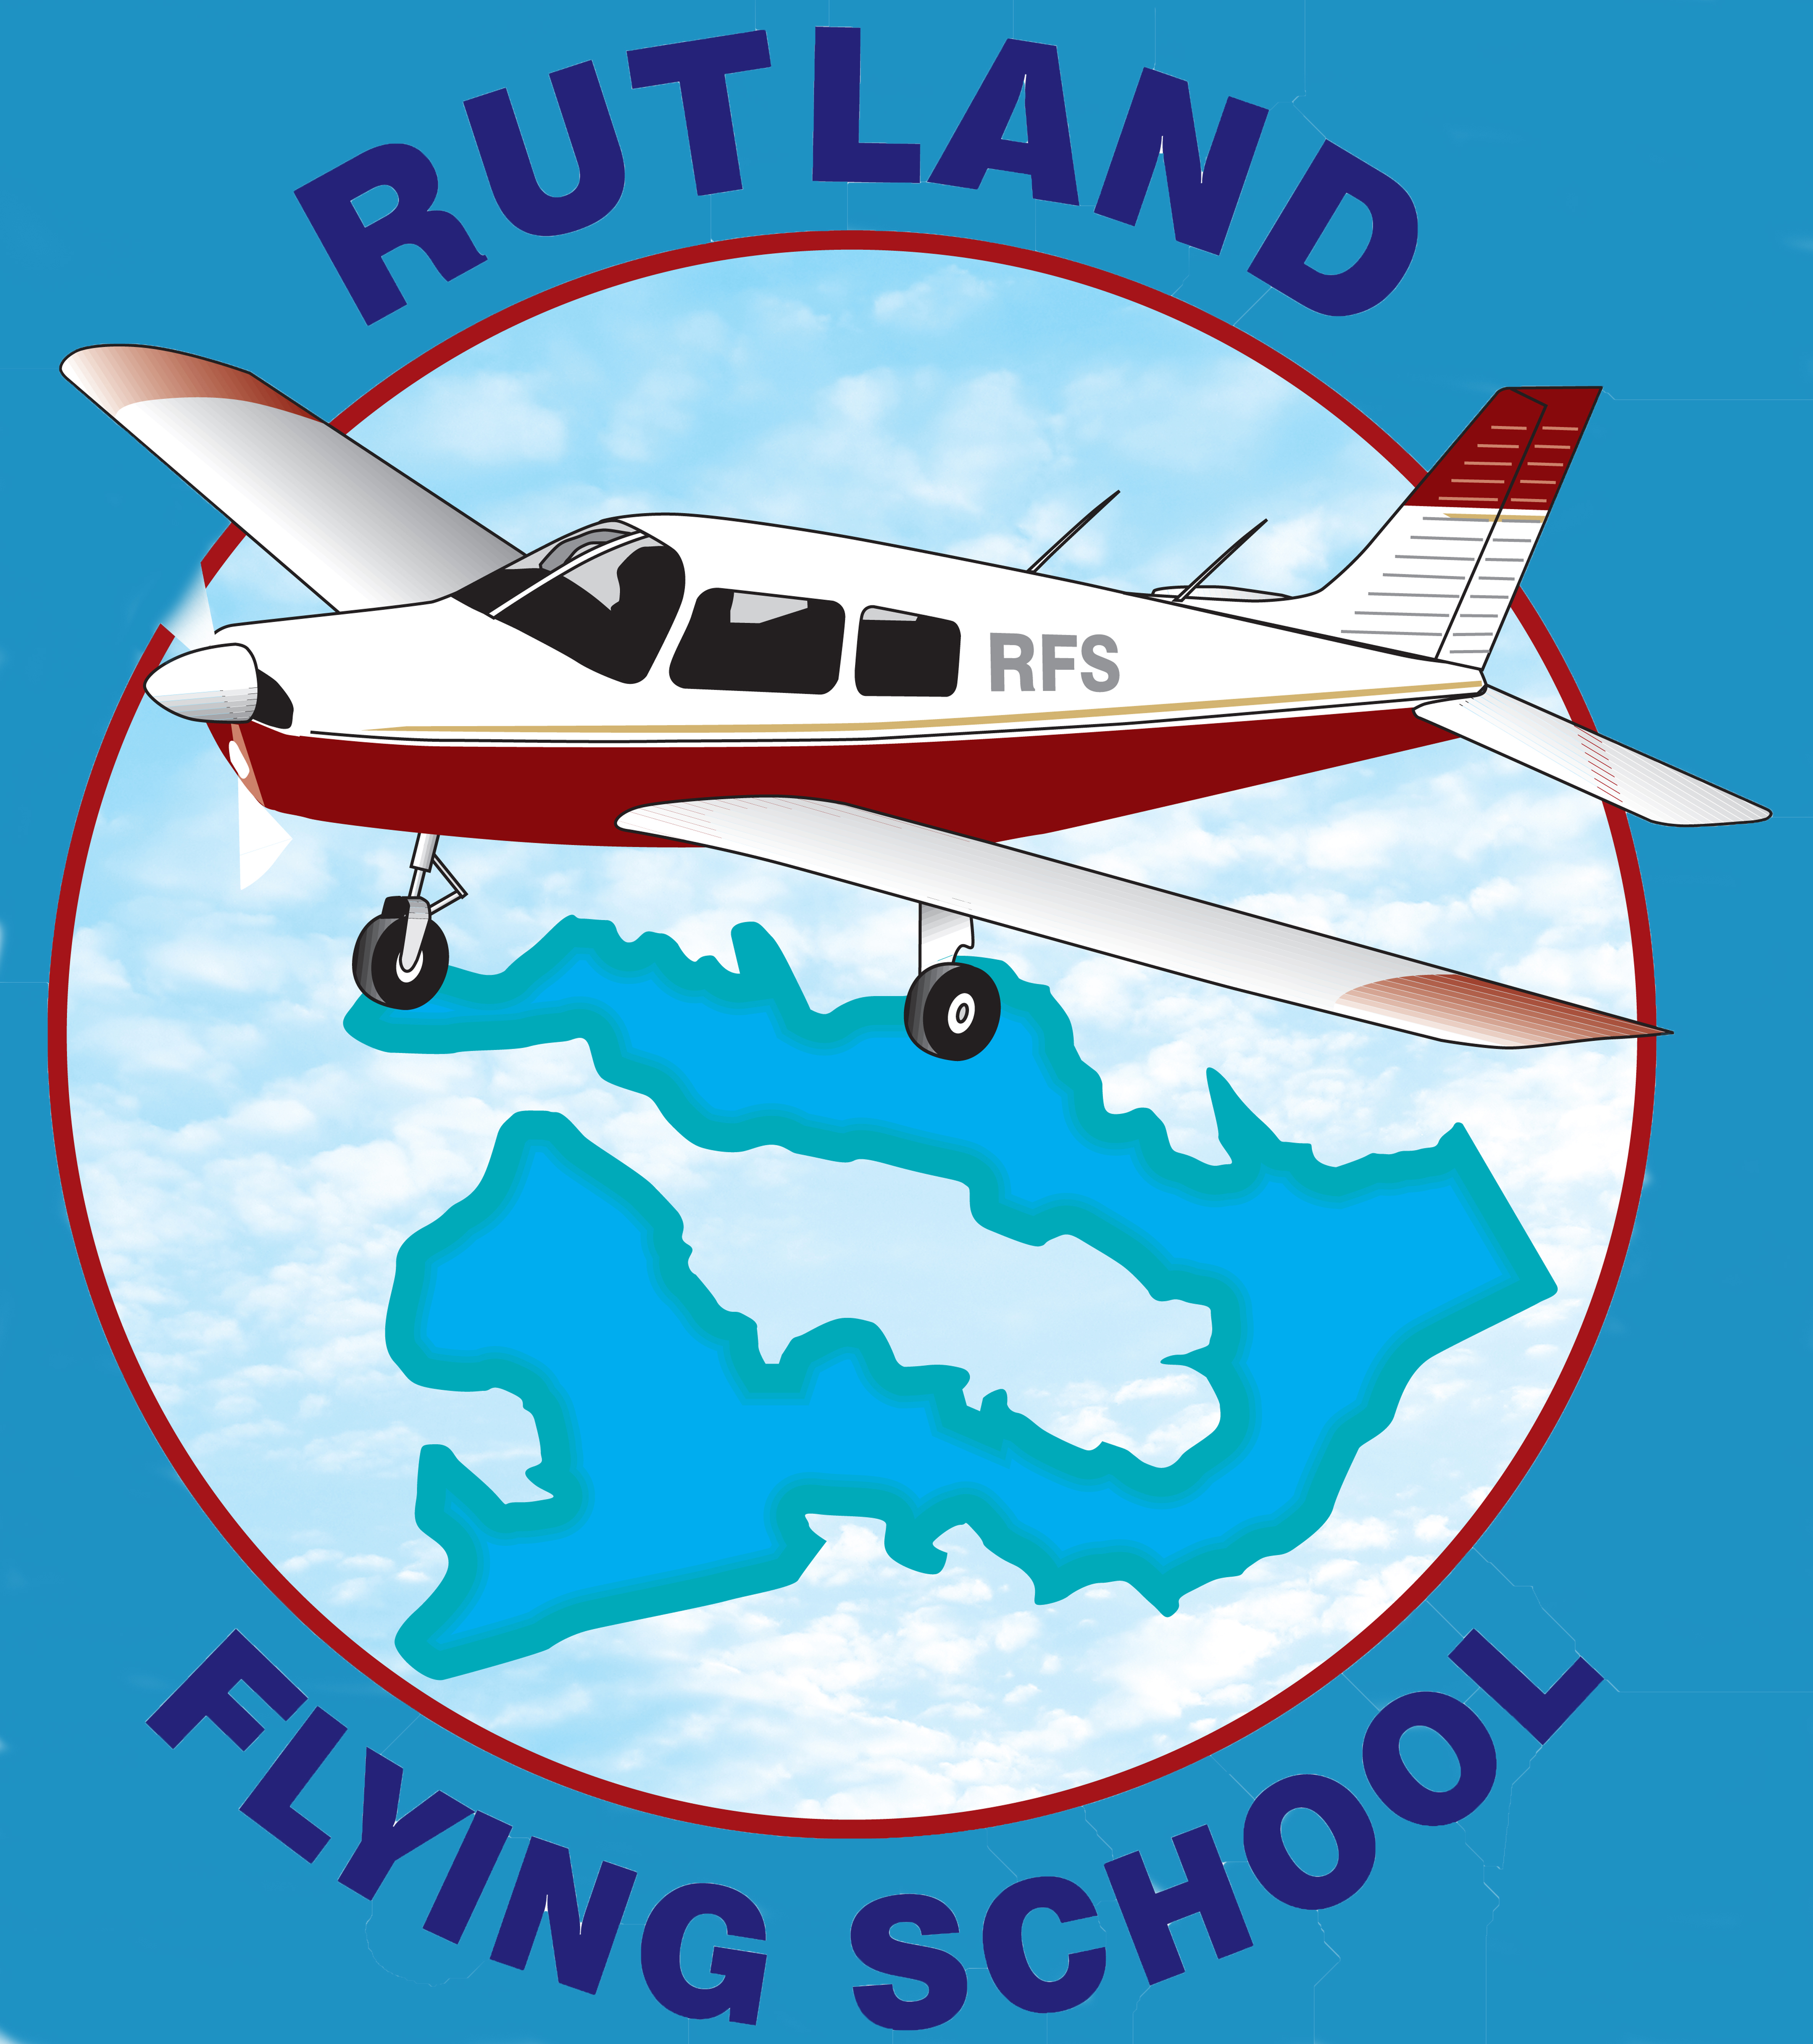 Flying school clipart #12